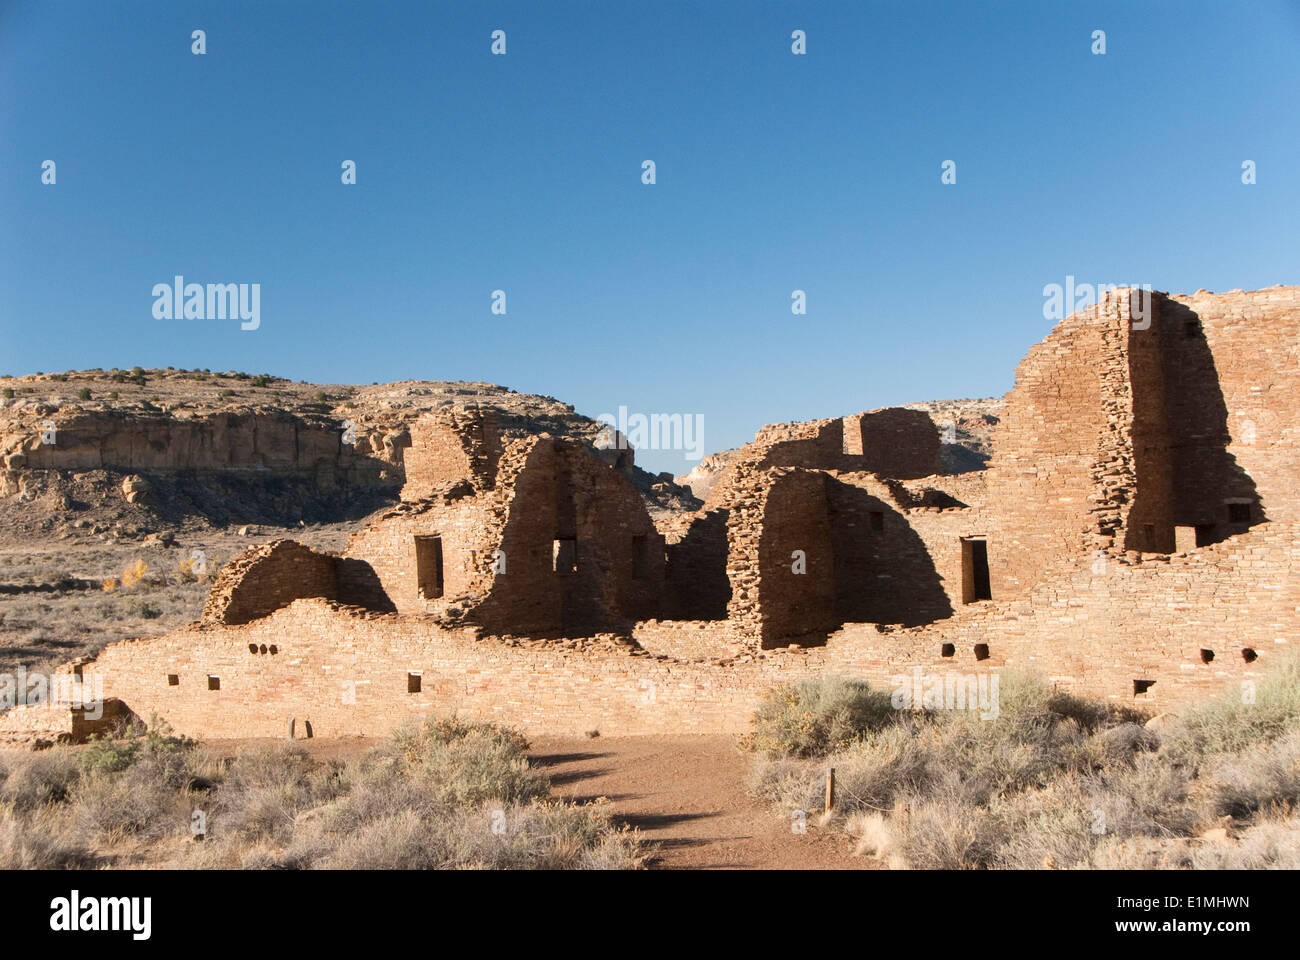 USA, New Mexico, Chaco Canyon National Historic Park, World Heritage Site, Pueblo Bonito - Stock Image